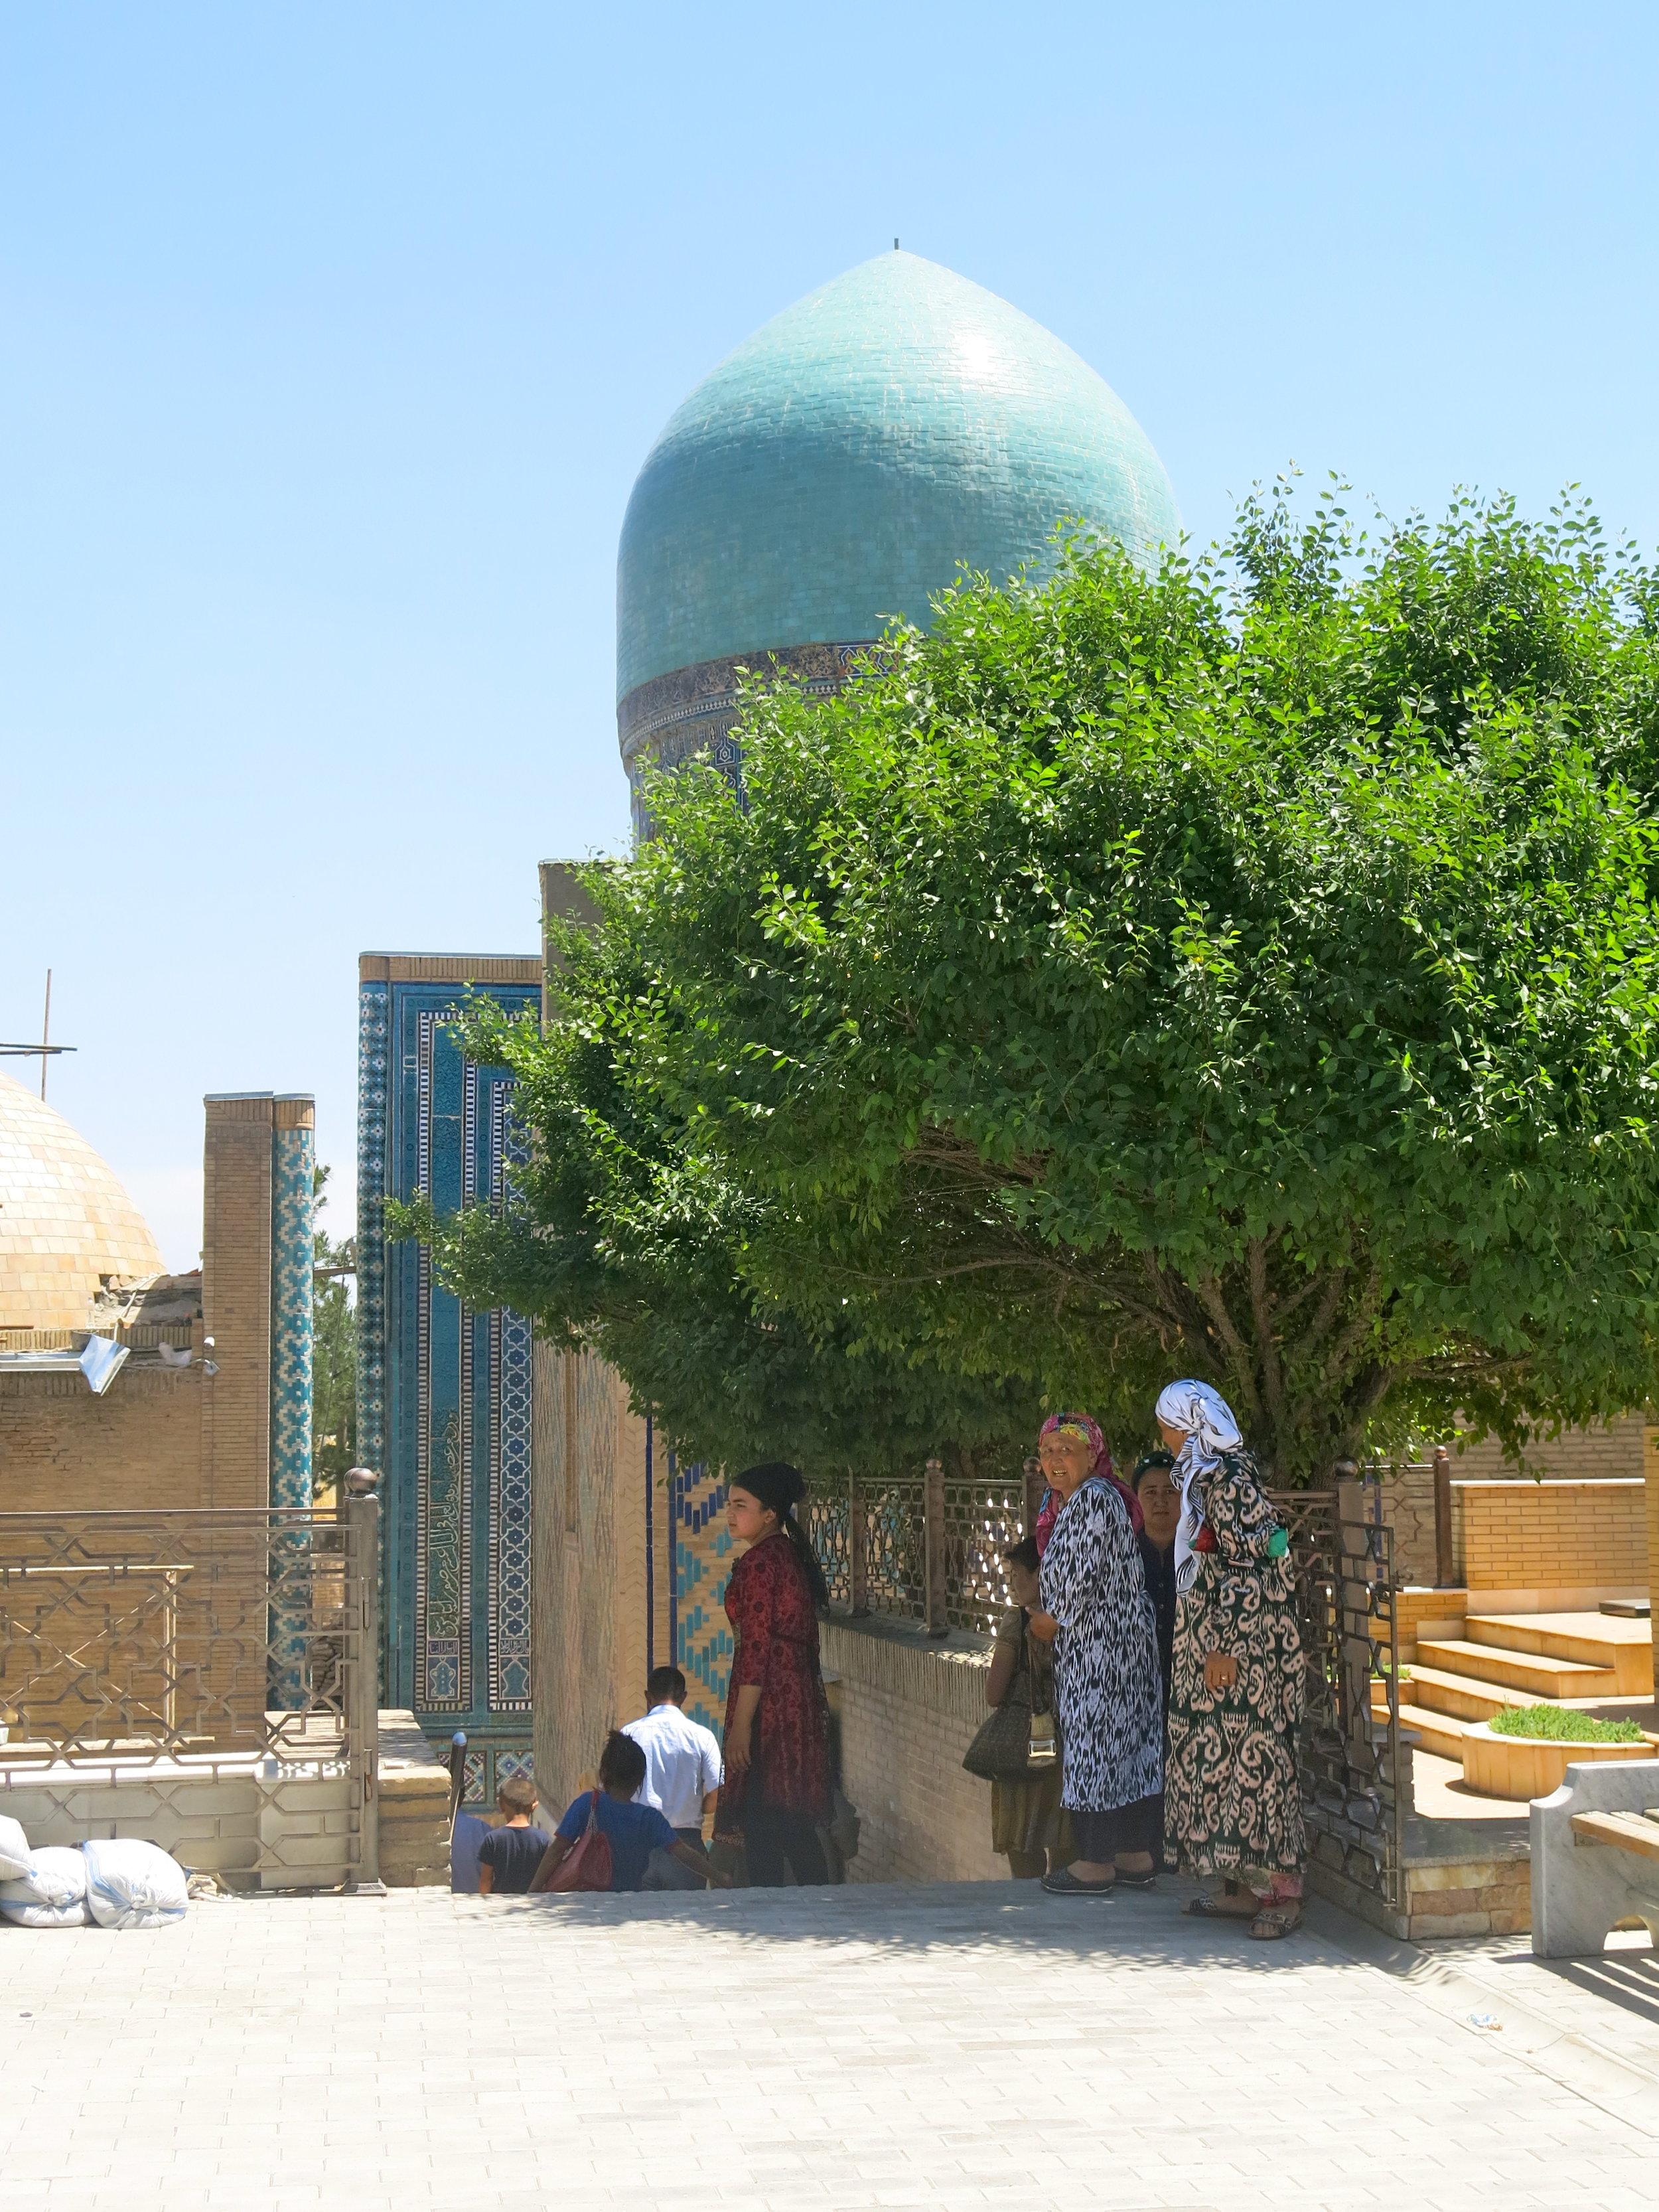 Uzbek women visiting the mausoleum